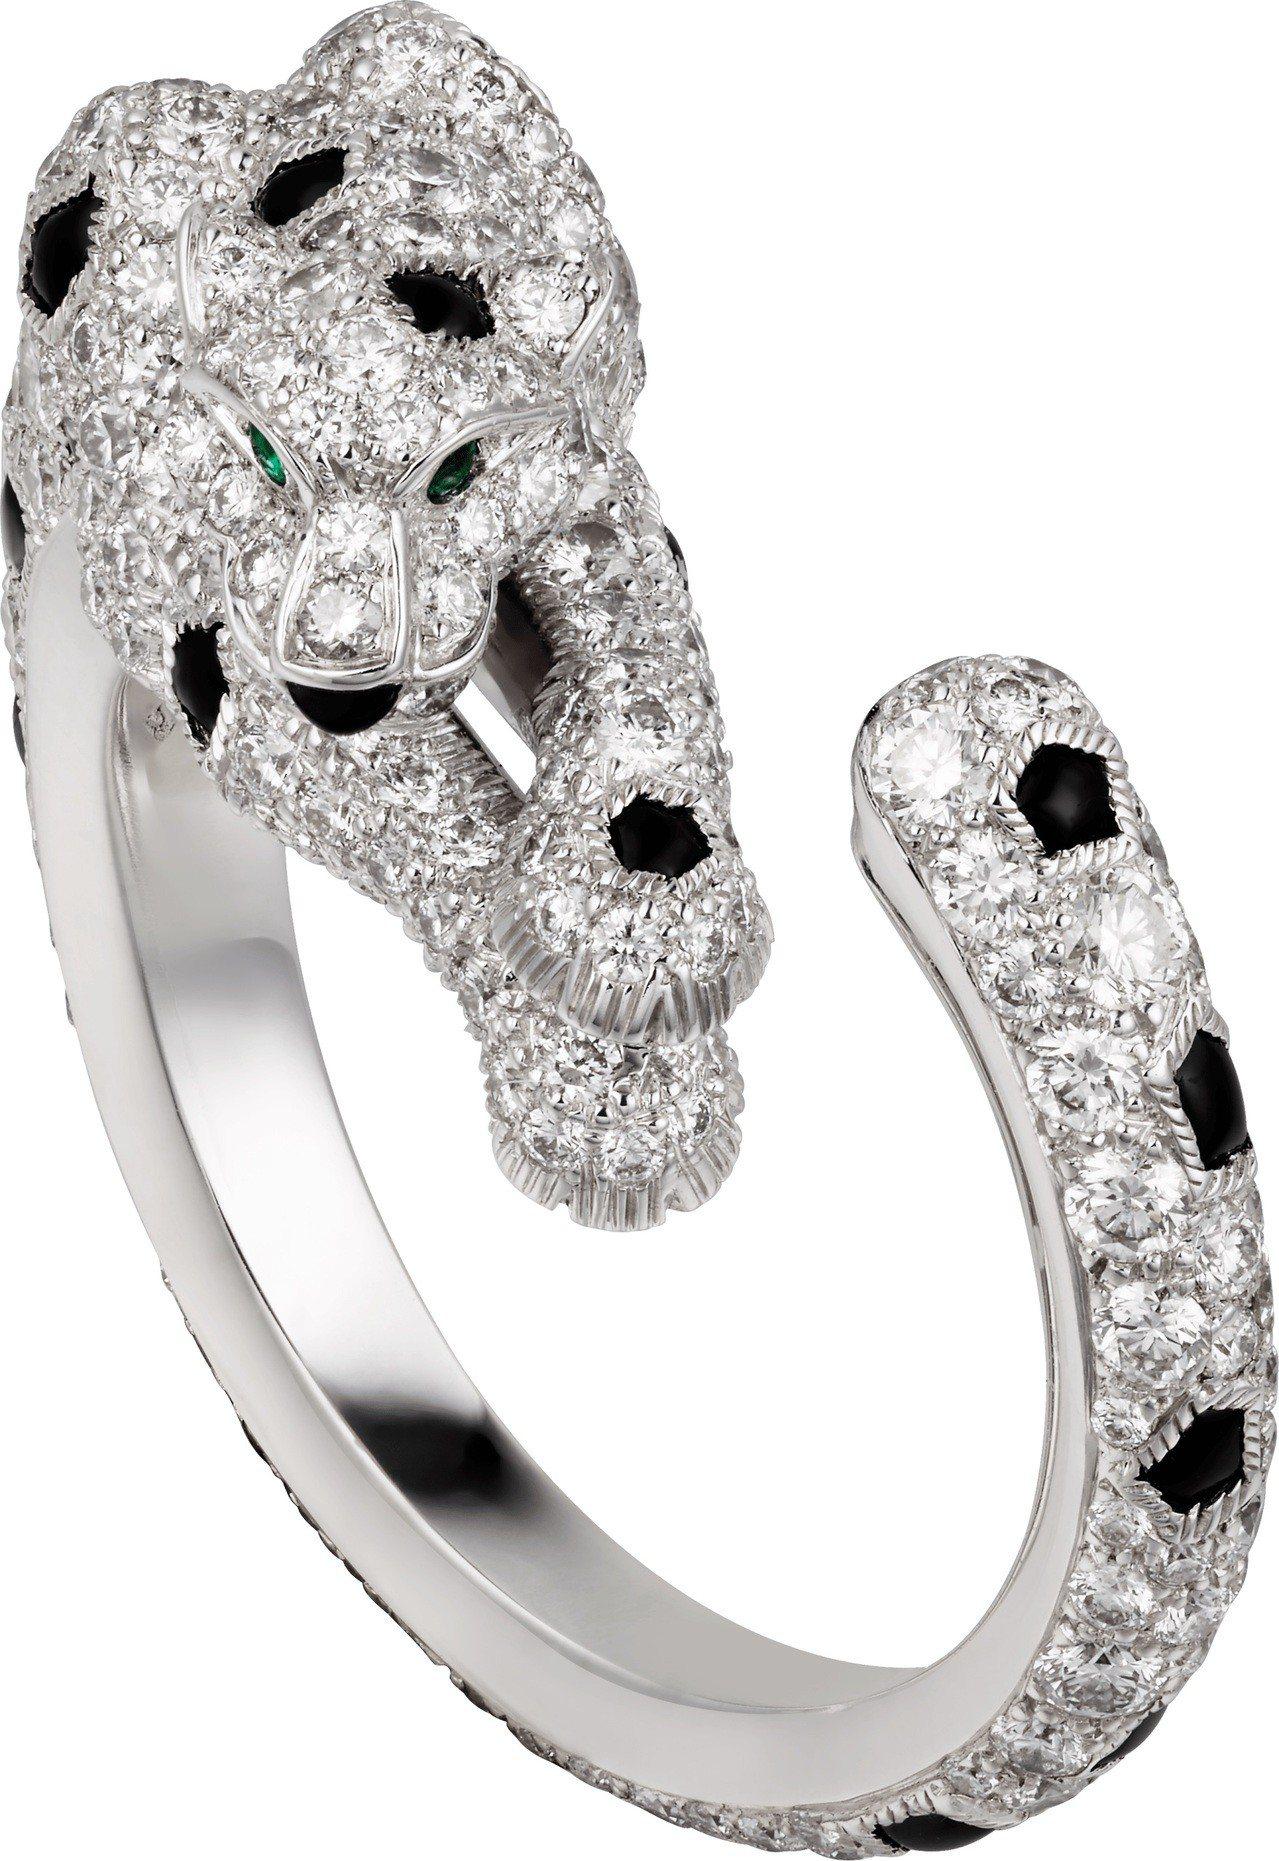 Panthère de Cartier美洲豹戒指,白K金鑲嵌祖母綠、縞瑪瑙、鑽石...